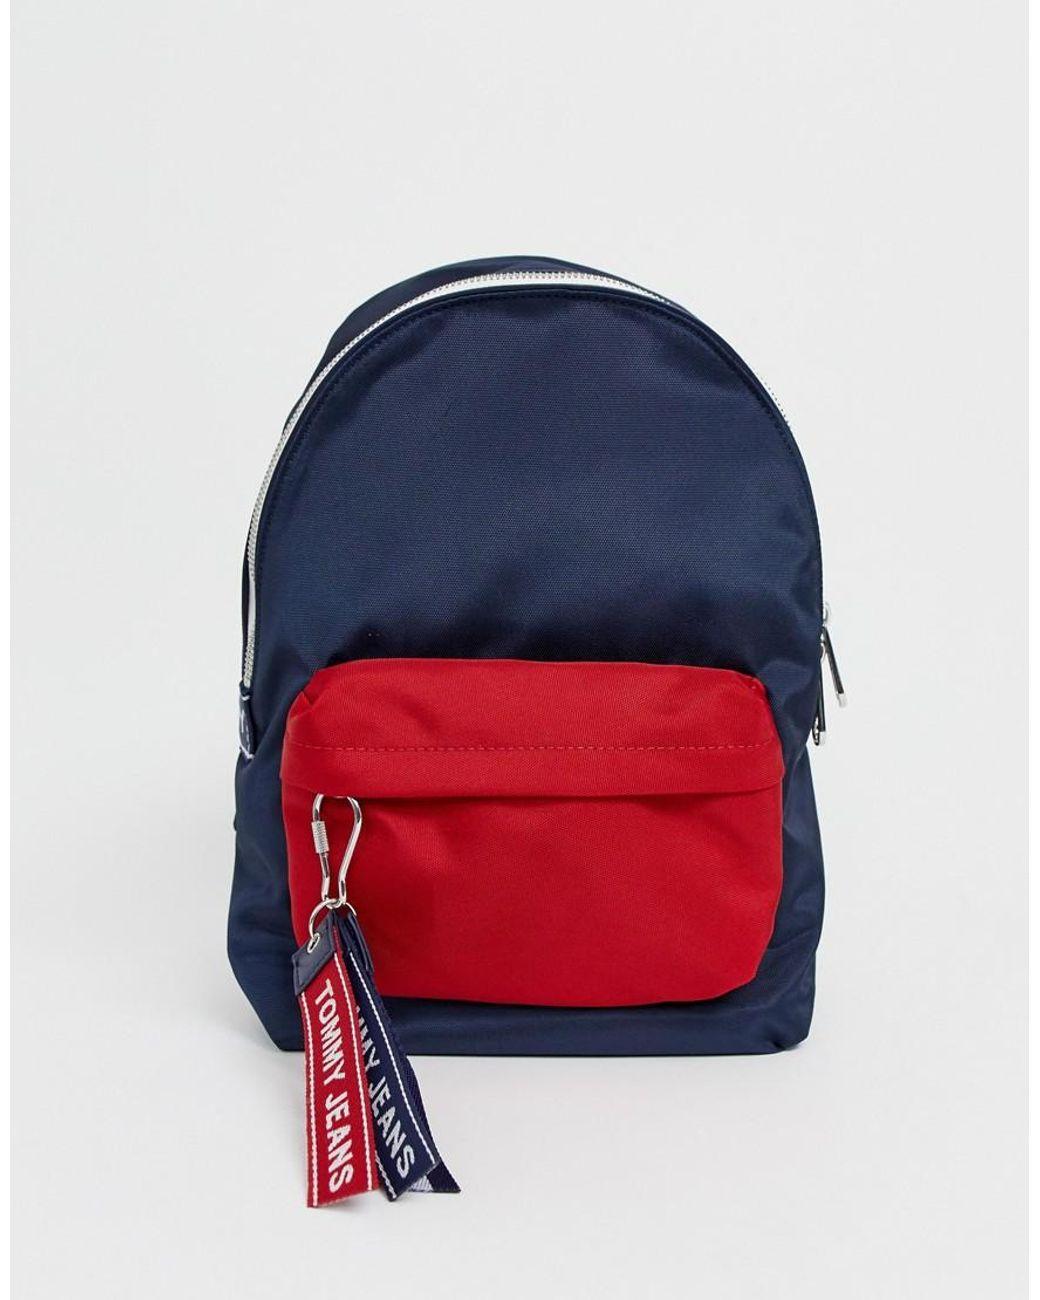 d0b59b28d Tommy Hilfiger Tj Small Logo Tape Denim Backpack in Blue - Save 25% - Lyst